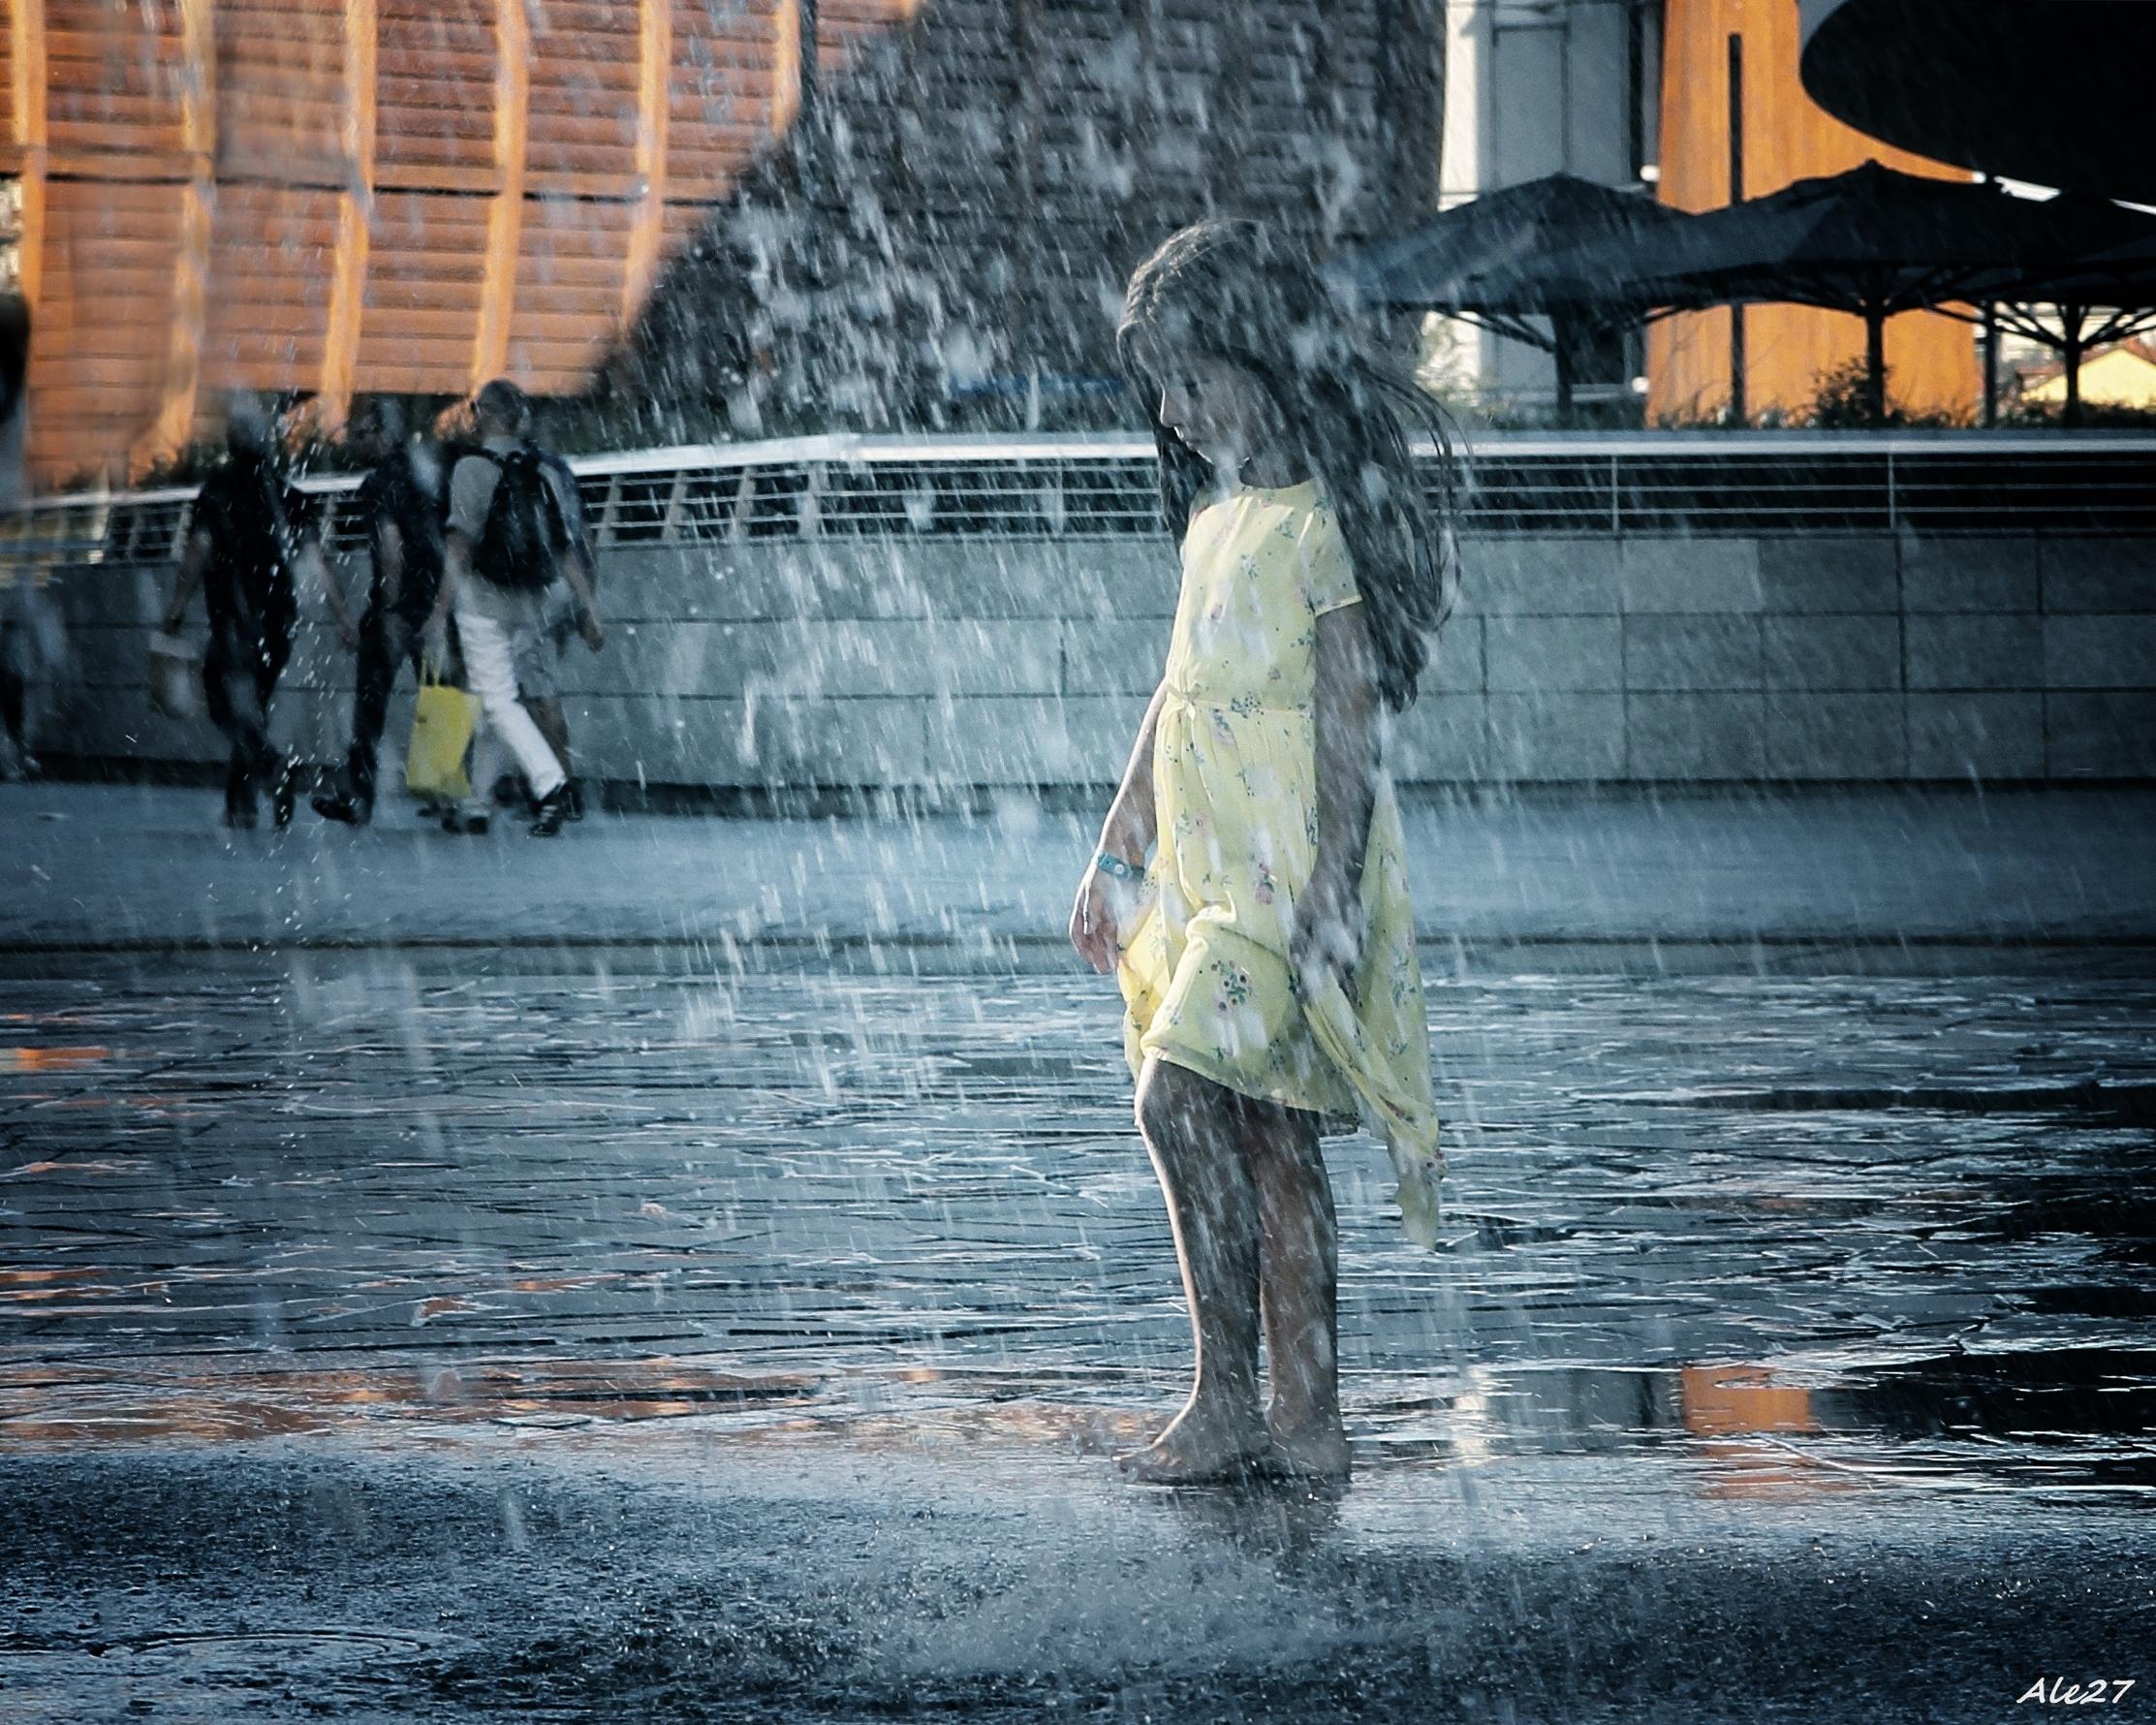 ... walking in the rain ......